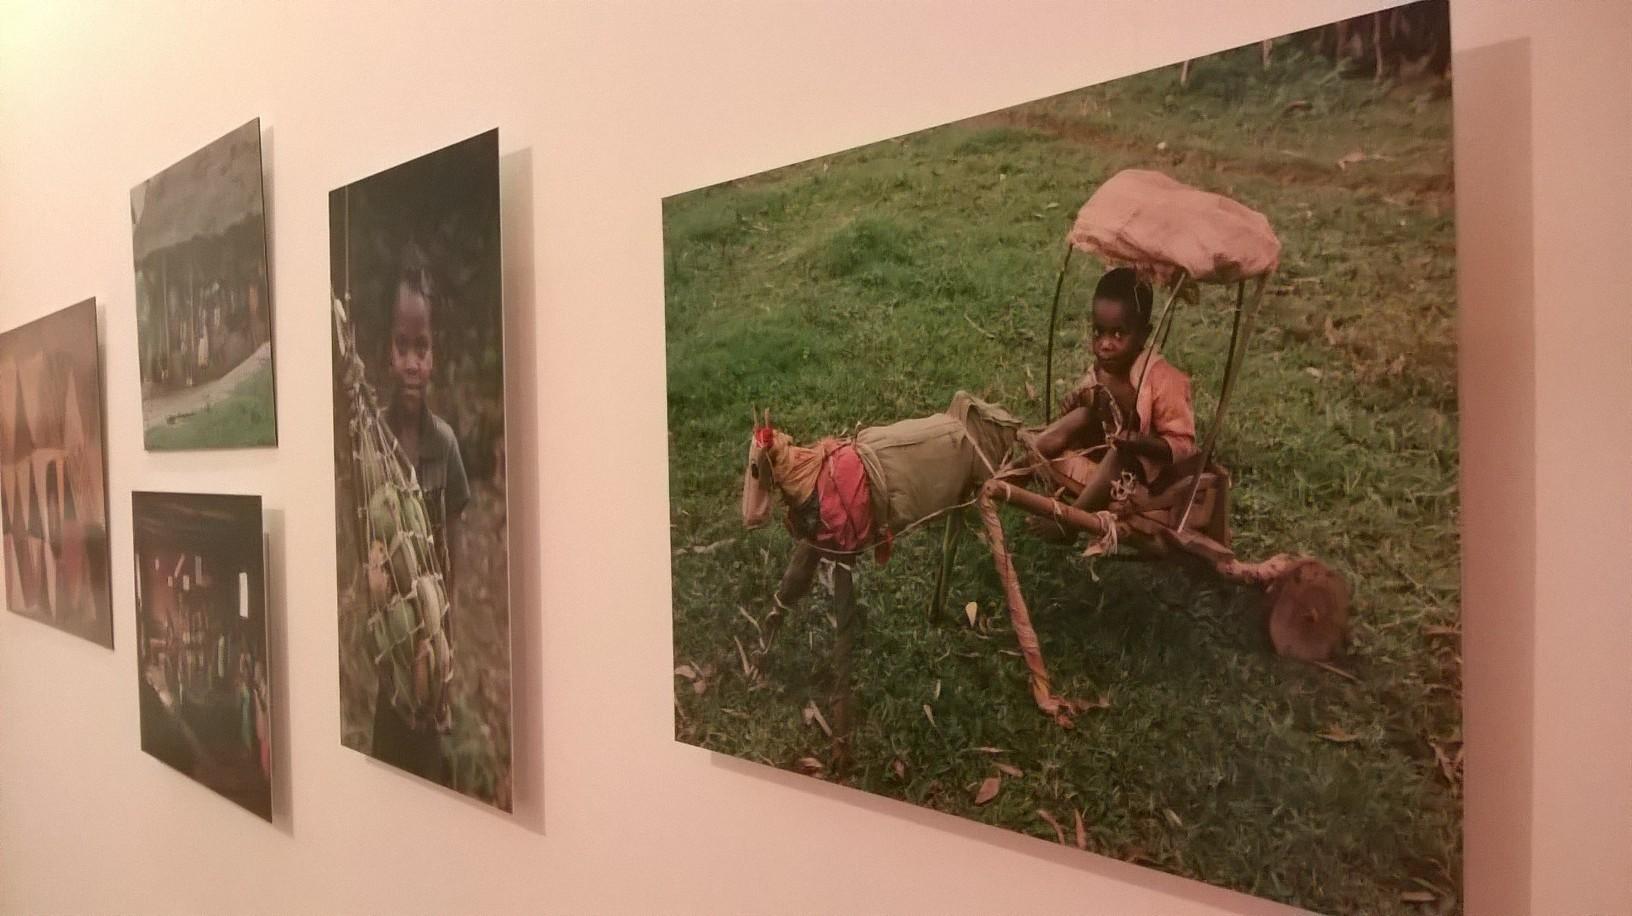 Festiwal fotograficzny w Arles